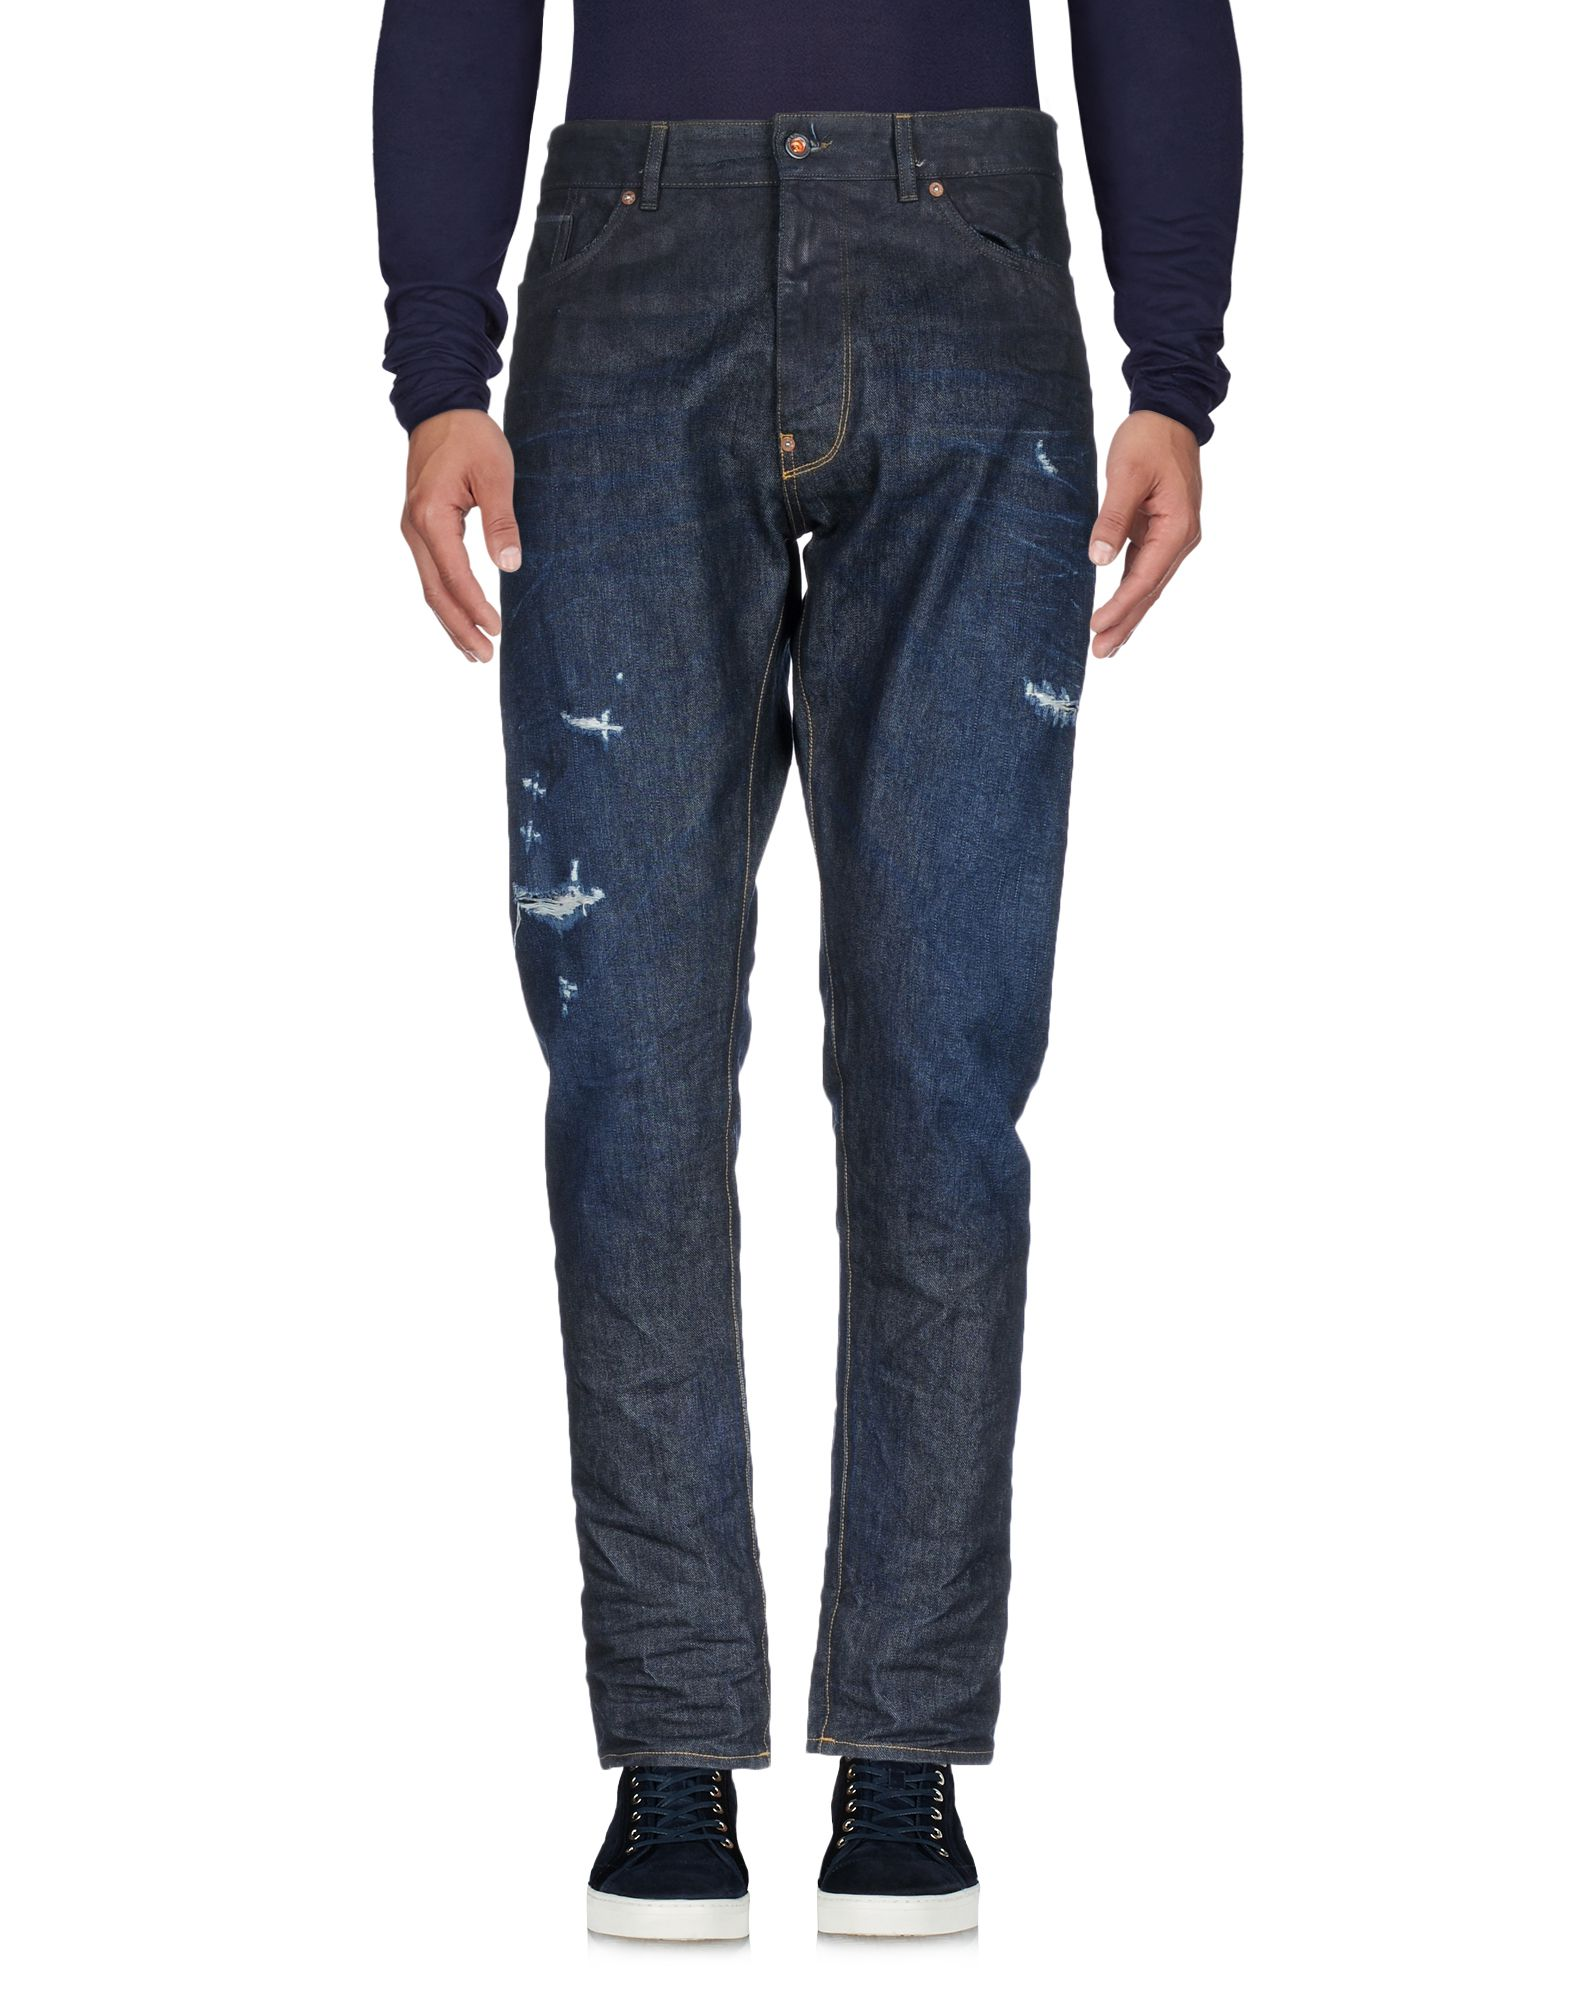 Pantaloni Jeans D.A.D. Denim Art Dept. Uomo Uomo Uomo - 42677607AB 158a33